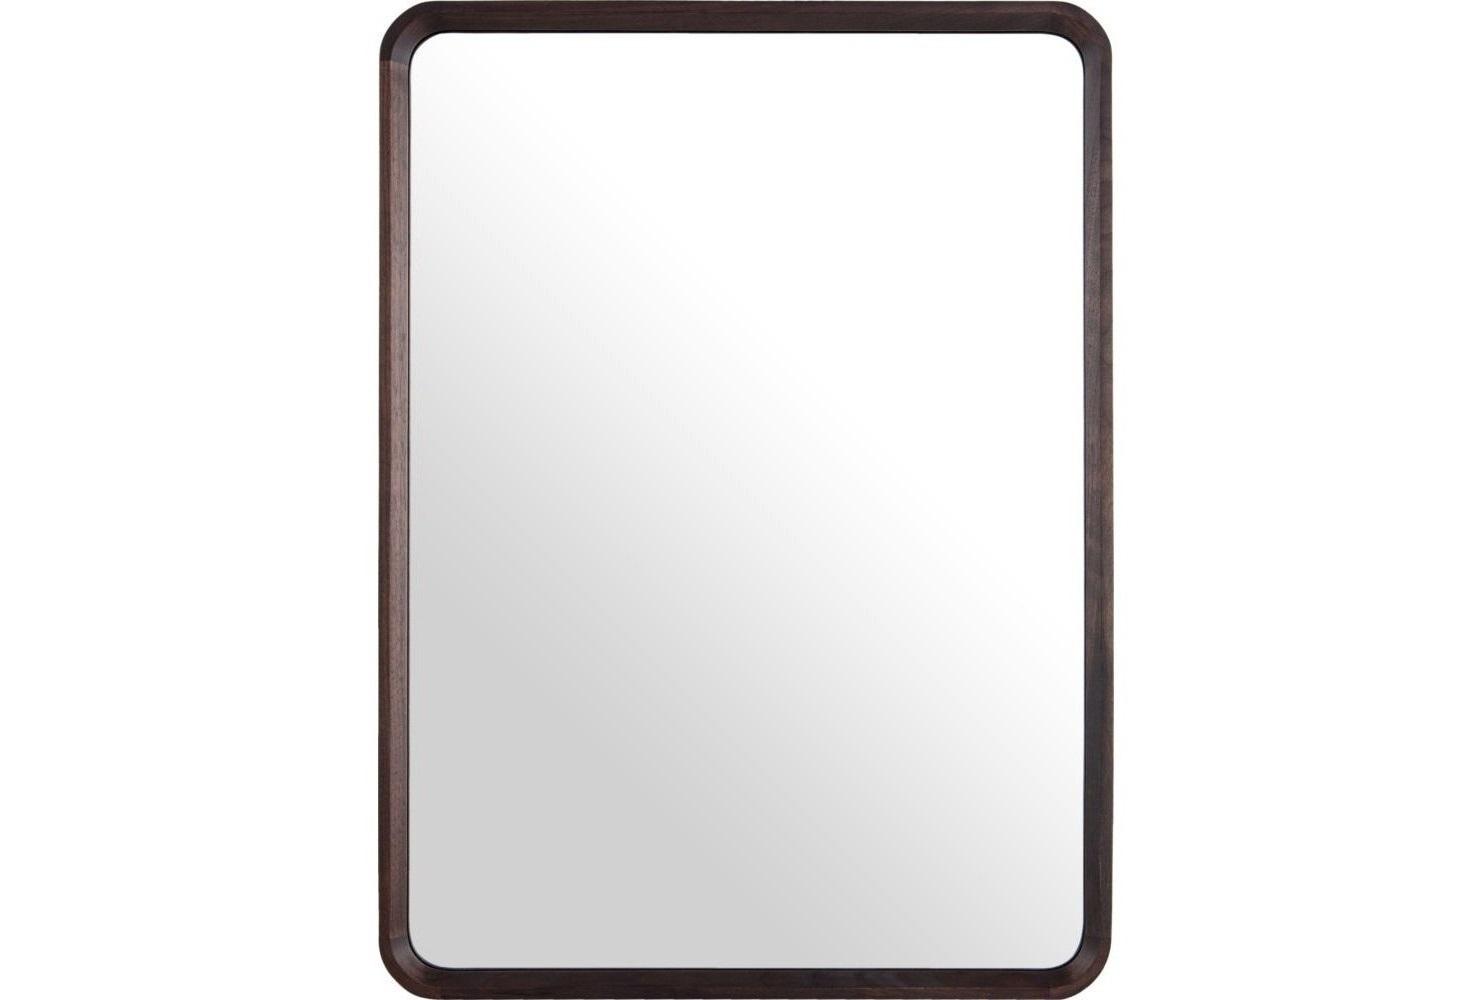 ЗеркалоНастенные зеркала<br><br><br>Material: Дерево<br>Ширина см: 80<br>Высота см: 59<br>Глубина см: 3